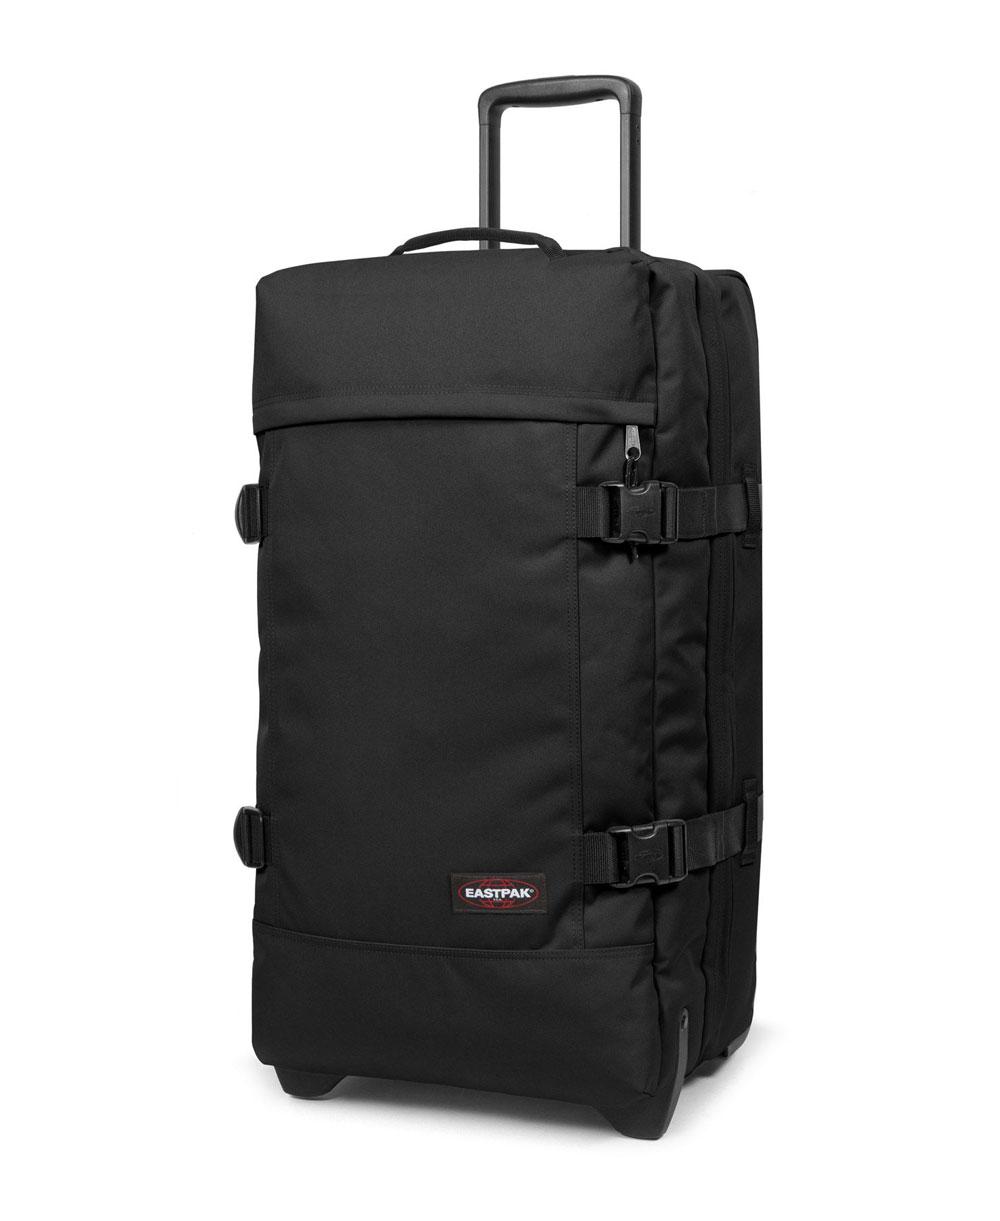 Tranverz M Suitcase 4 Wheels Black TSA Lock